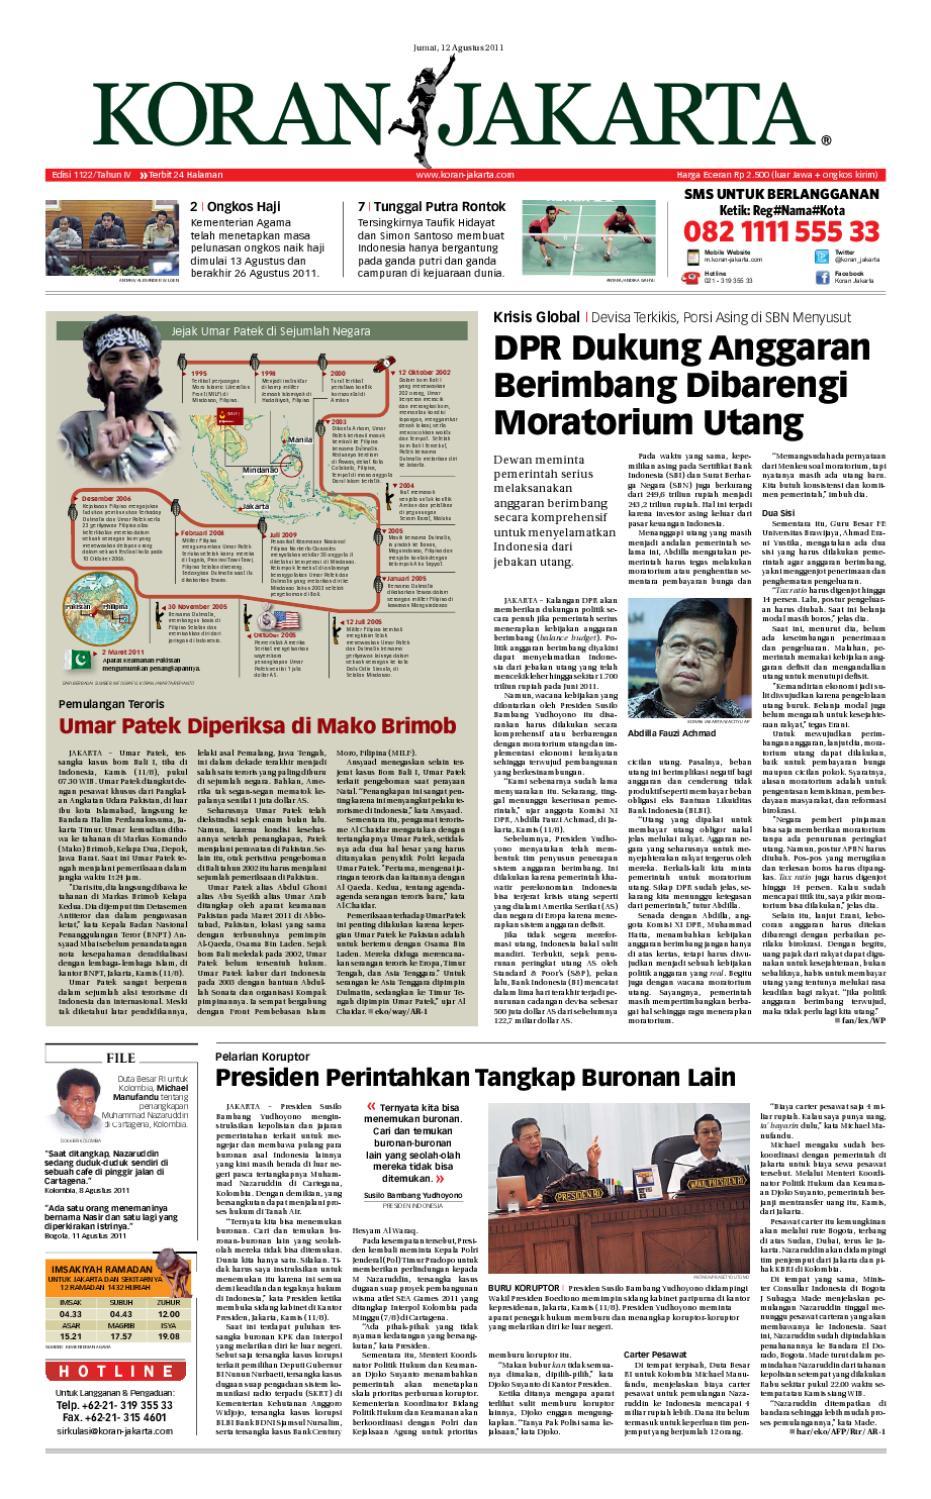 Edisi 1006 14 April 2011 By Pt Berita Nusantara Issuu Rejeki Tcash Voucher Mcdonaldamp039s Rp 300000 1122 12 Agustus 2011pdf